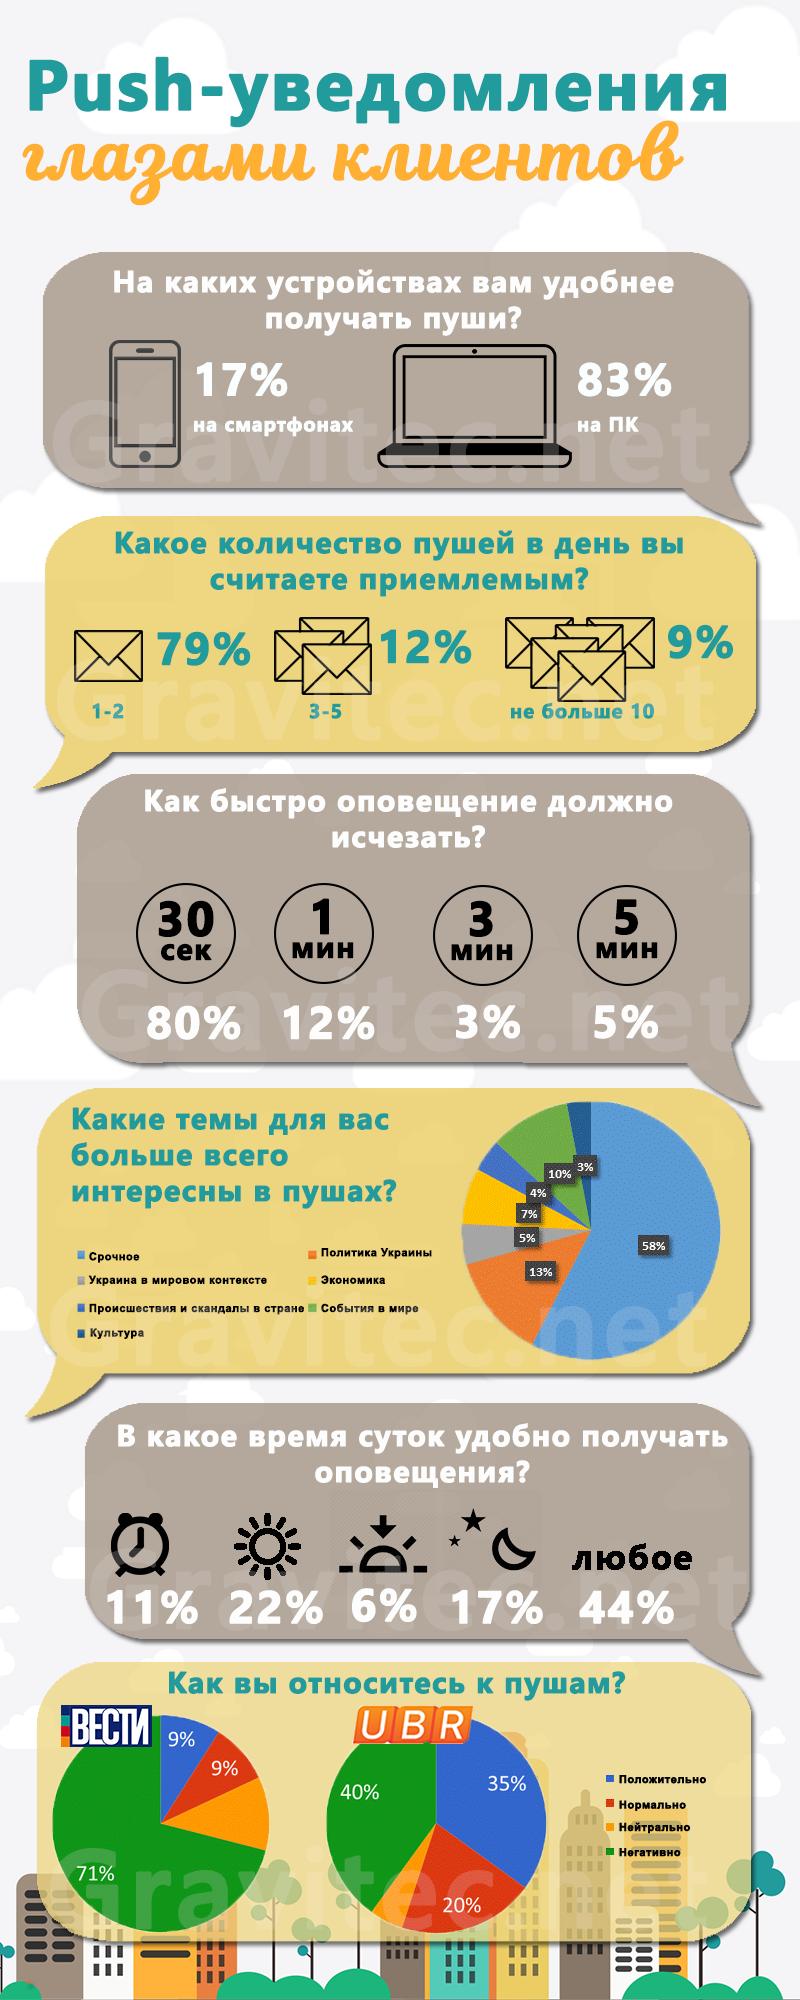 vesti infographics logo